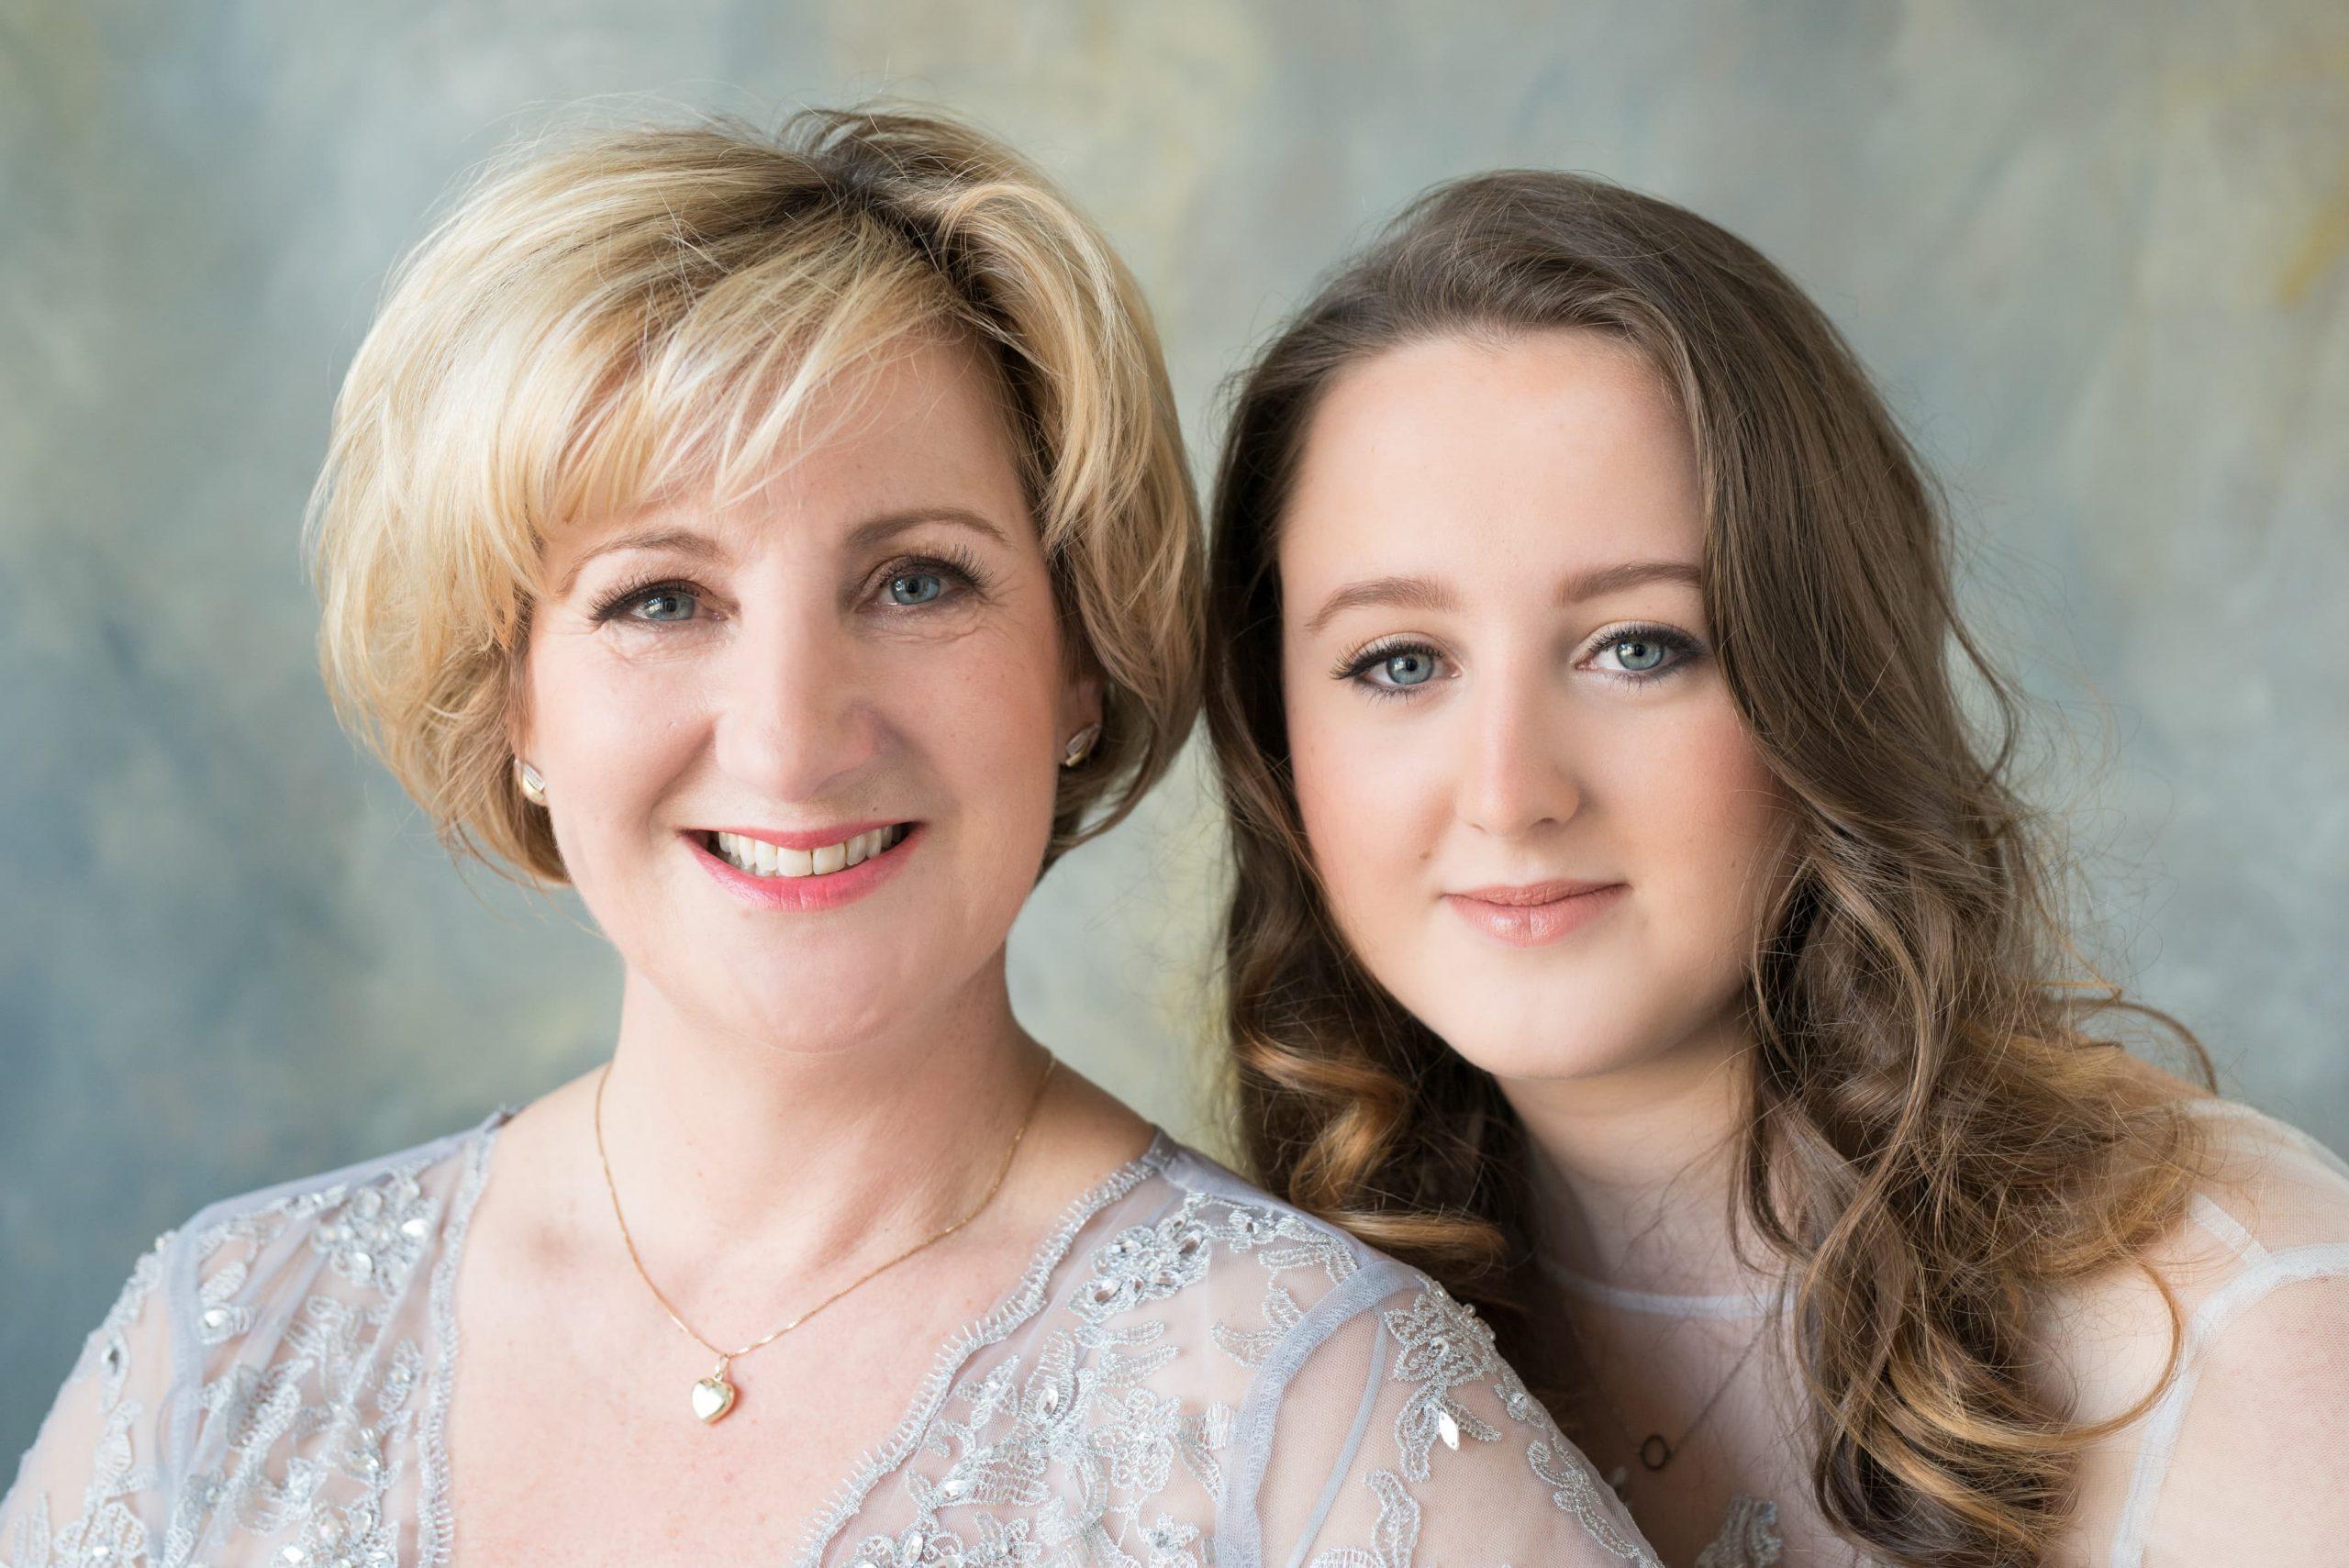 Family Portraits moeder en dochter familie fotoshoot